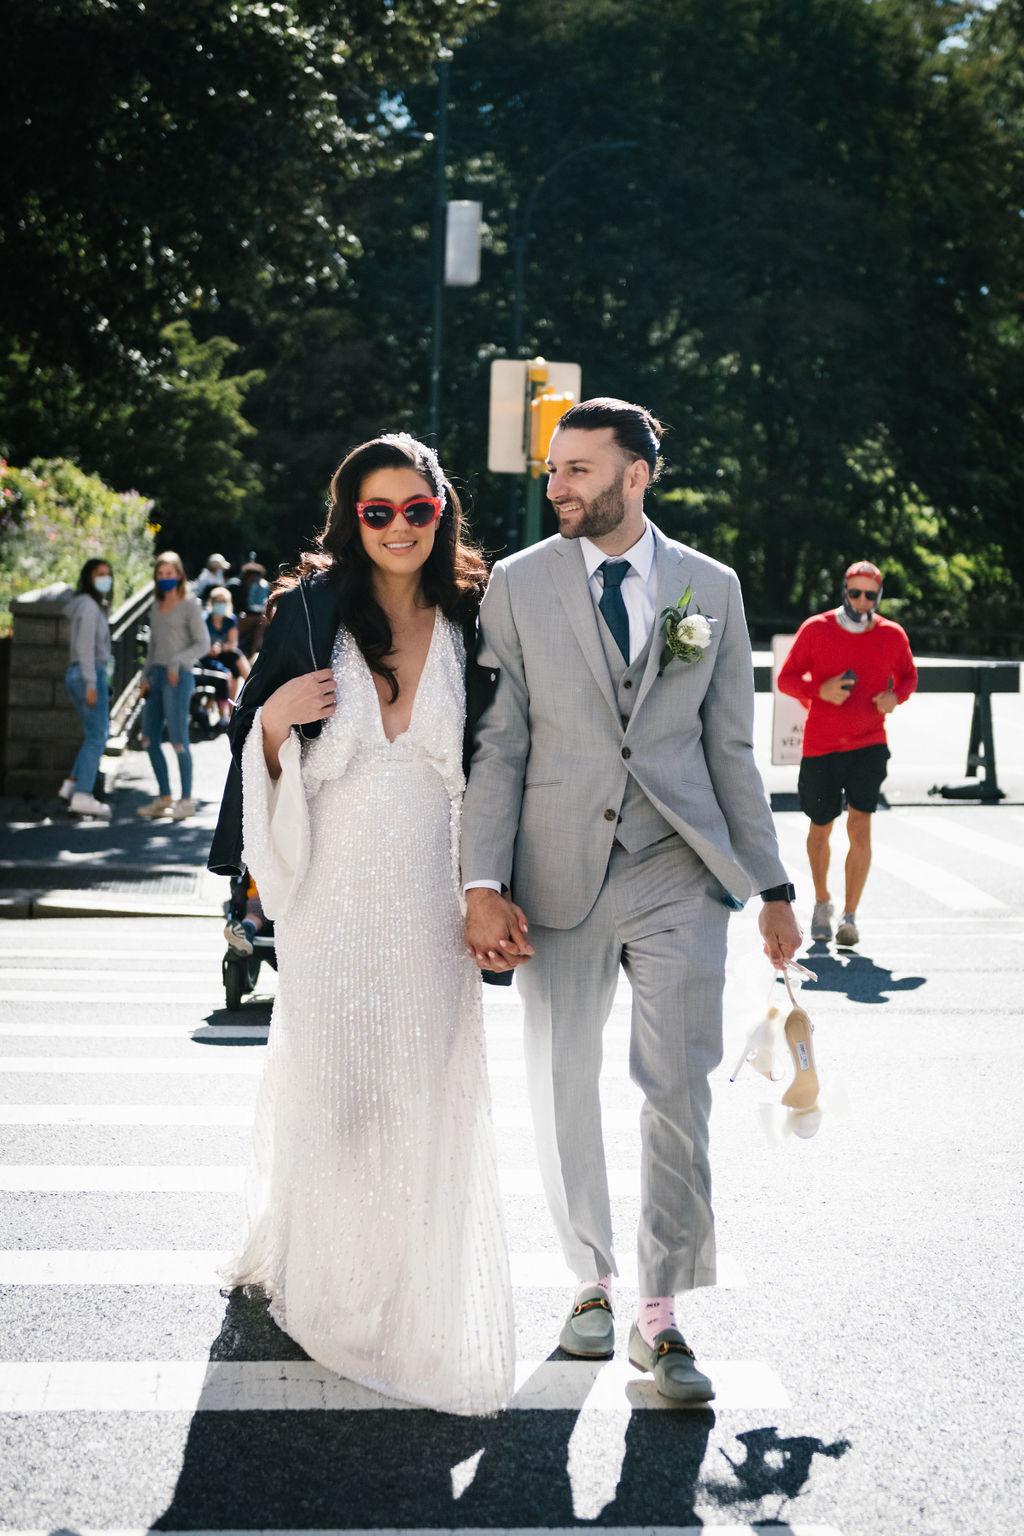 Central Park Micro Wedding-Everly Studios-23